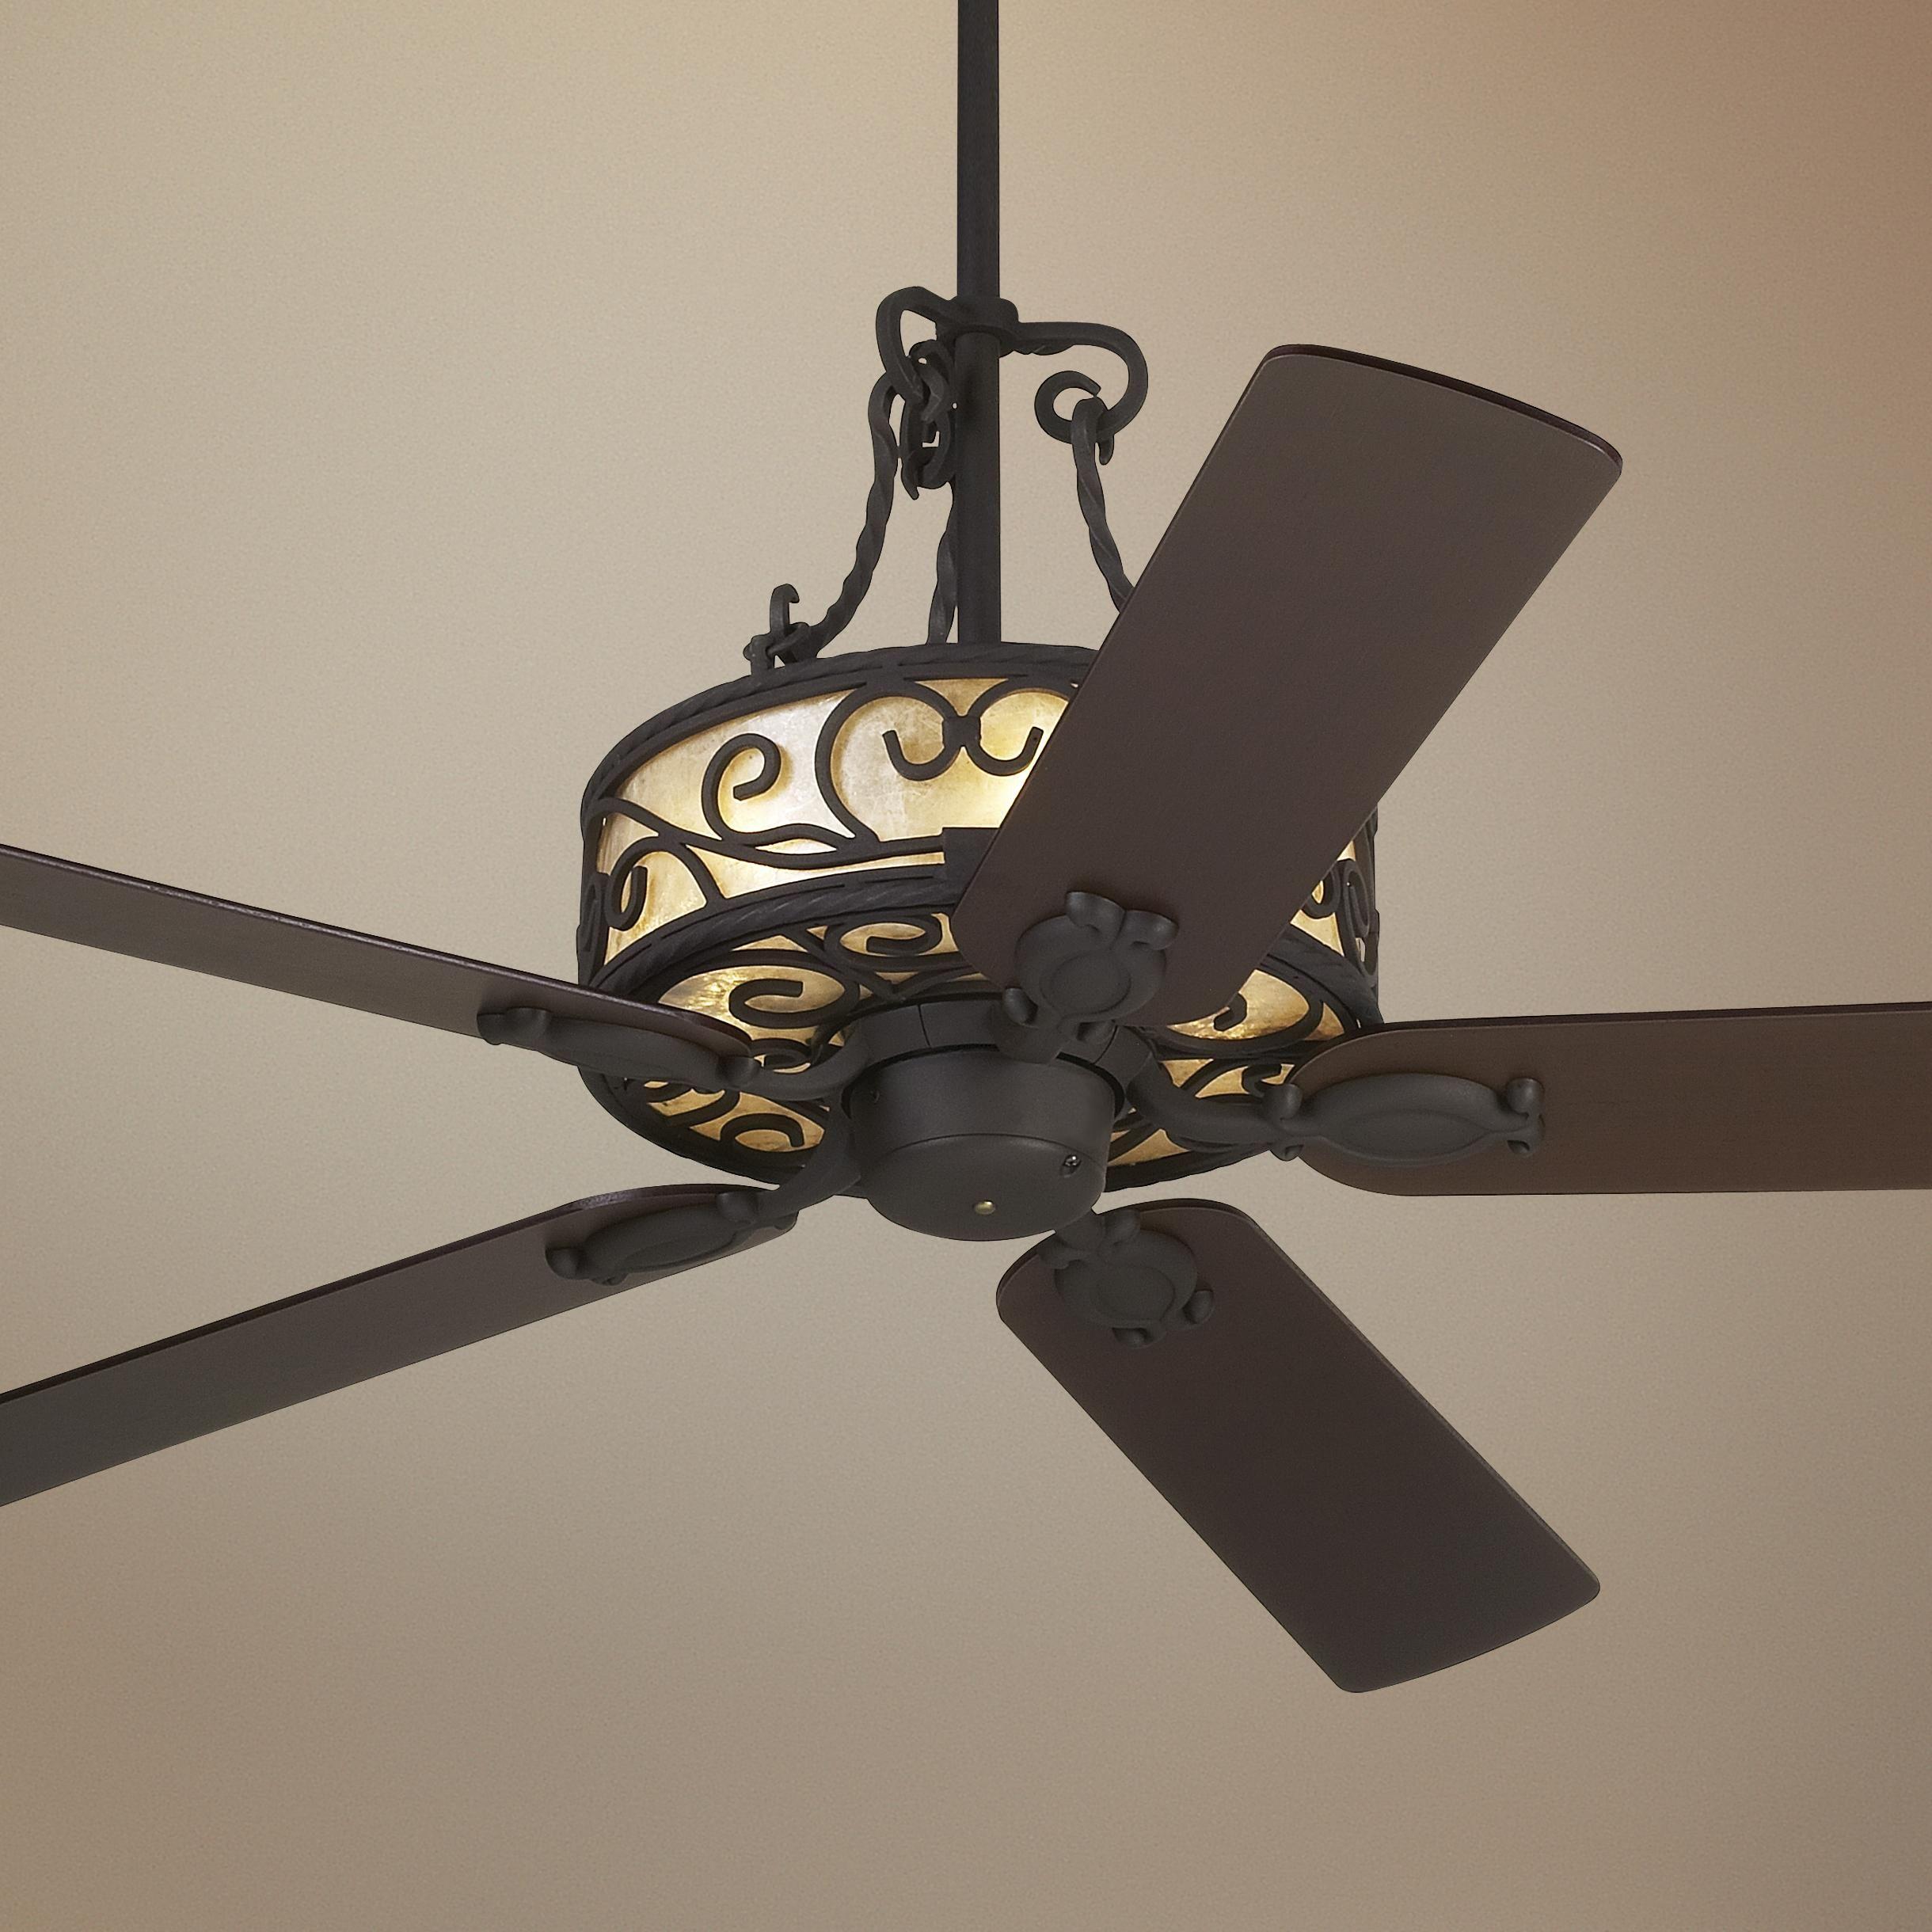 Spanish Style Ceiling Fan | Atcsagacity.com